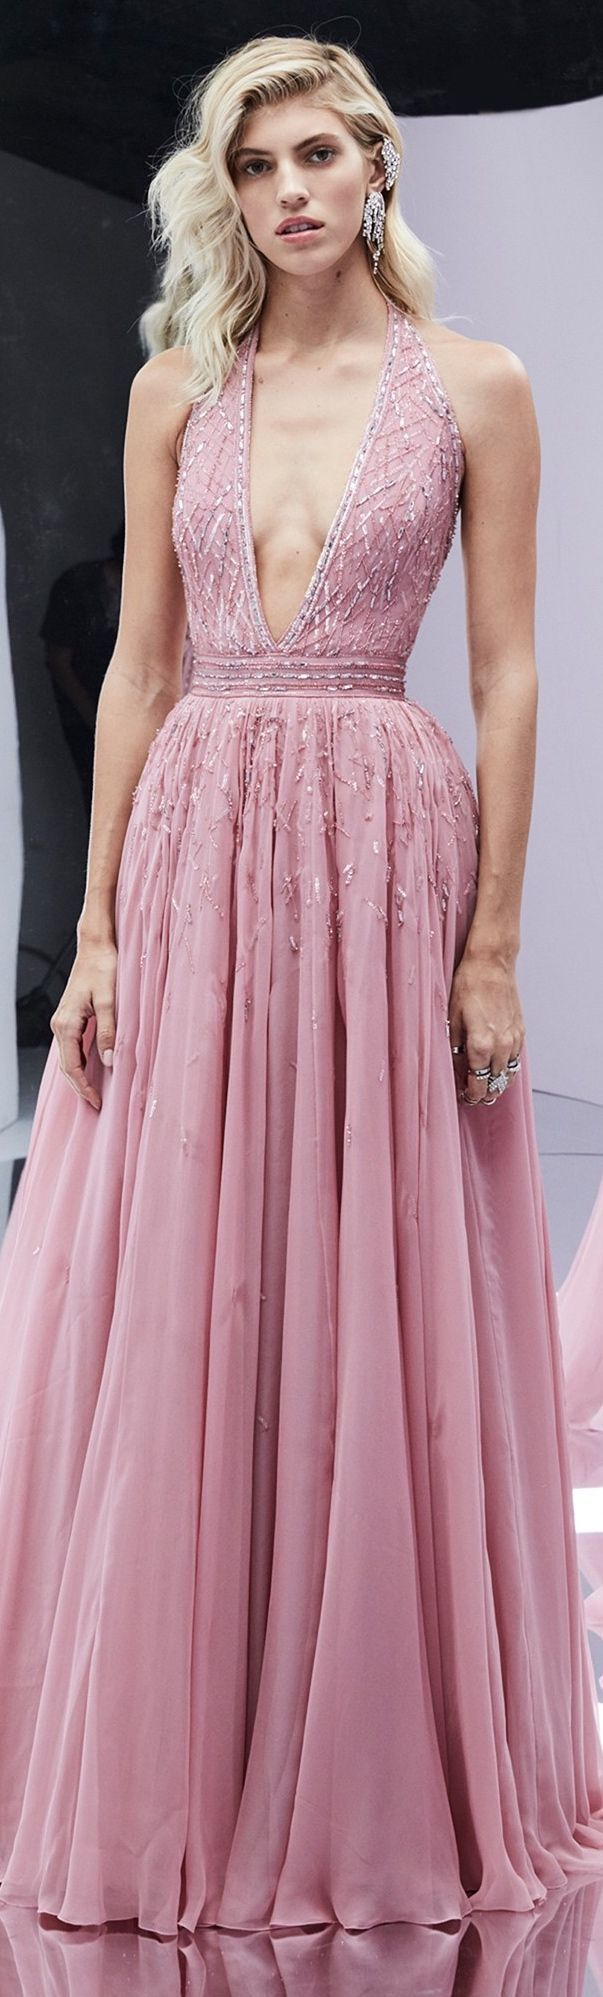 stunning prom dresses,prom maxi dress 2017 #uniors #dresses 2018e-news.com